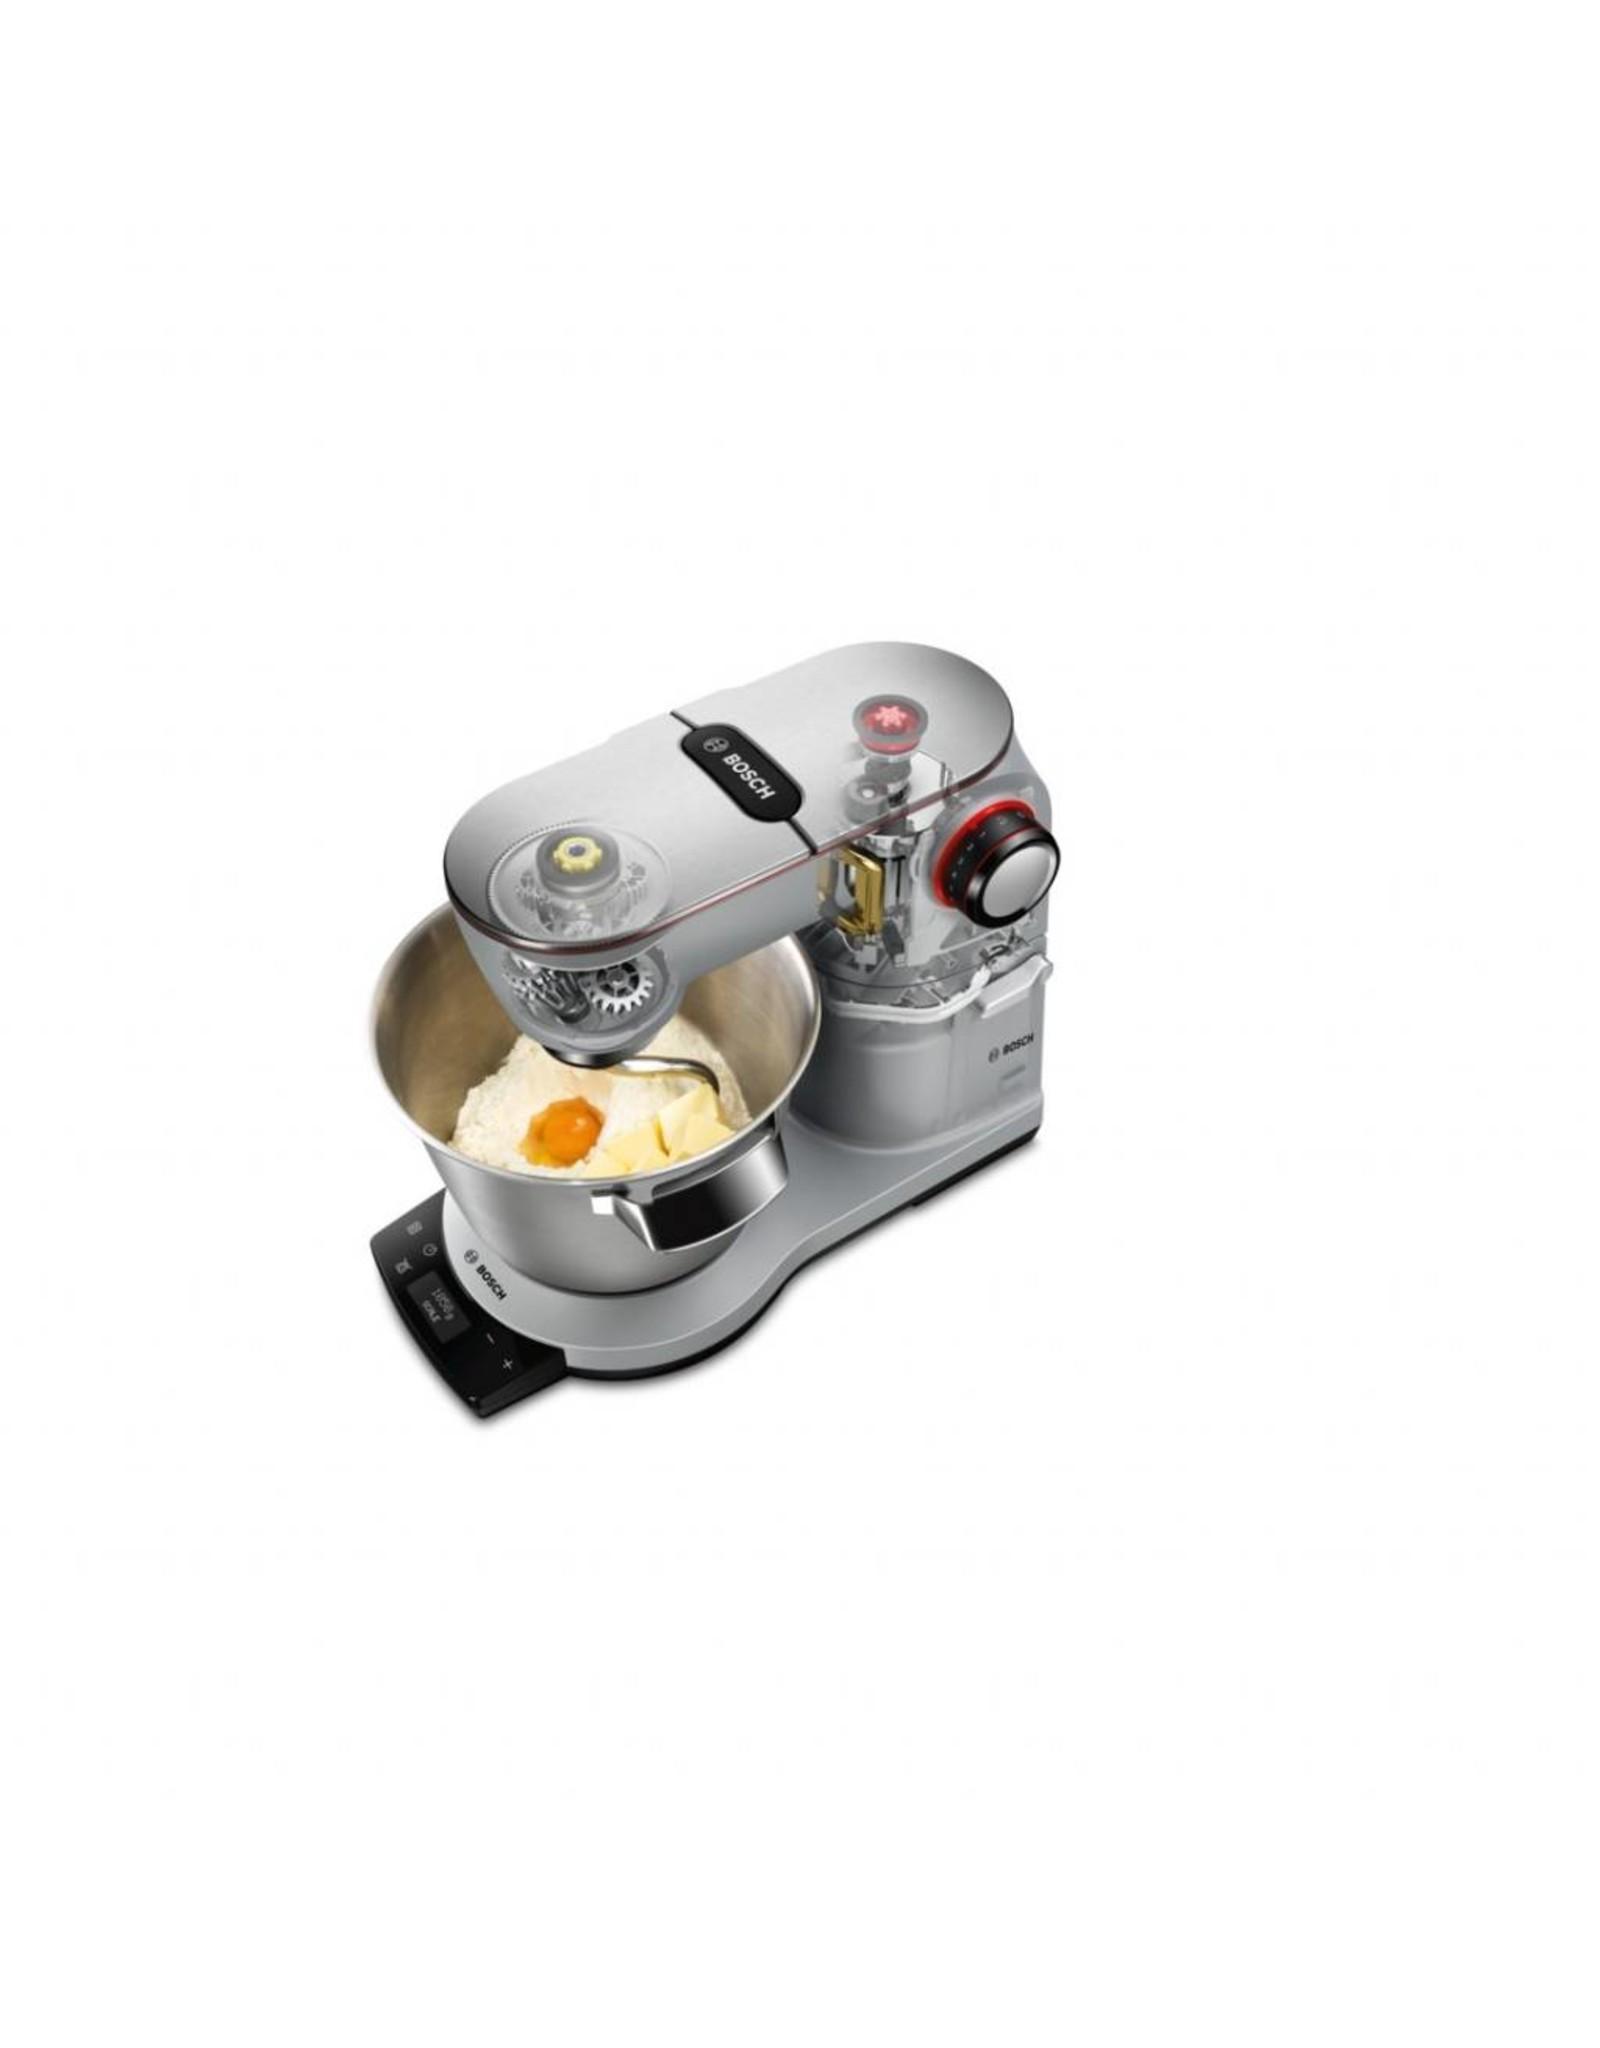 Bosch Bosch MUM9AX5S00 OptiMUM Keukenmachine